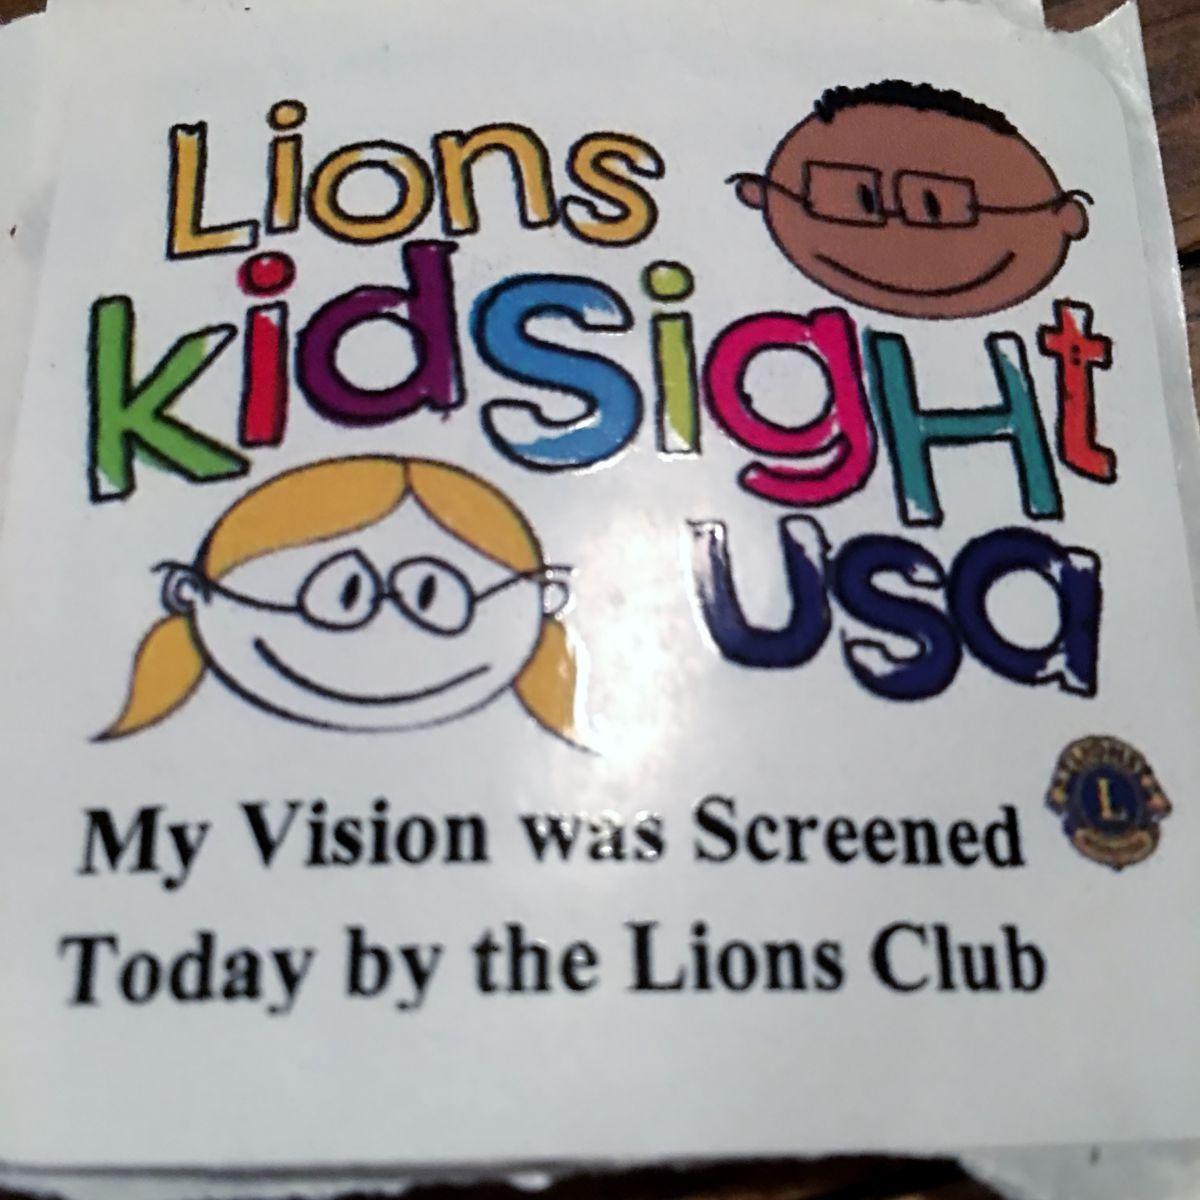 Lions KidSight USA